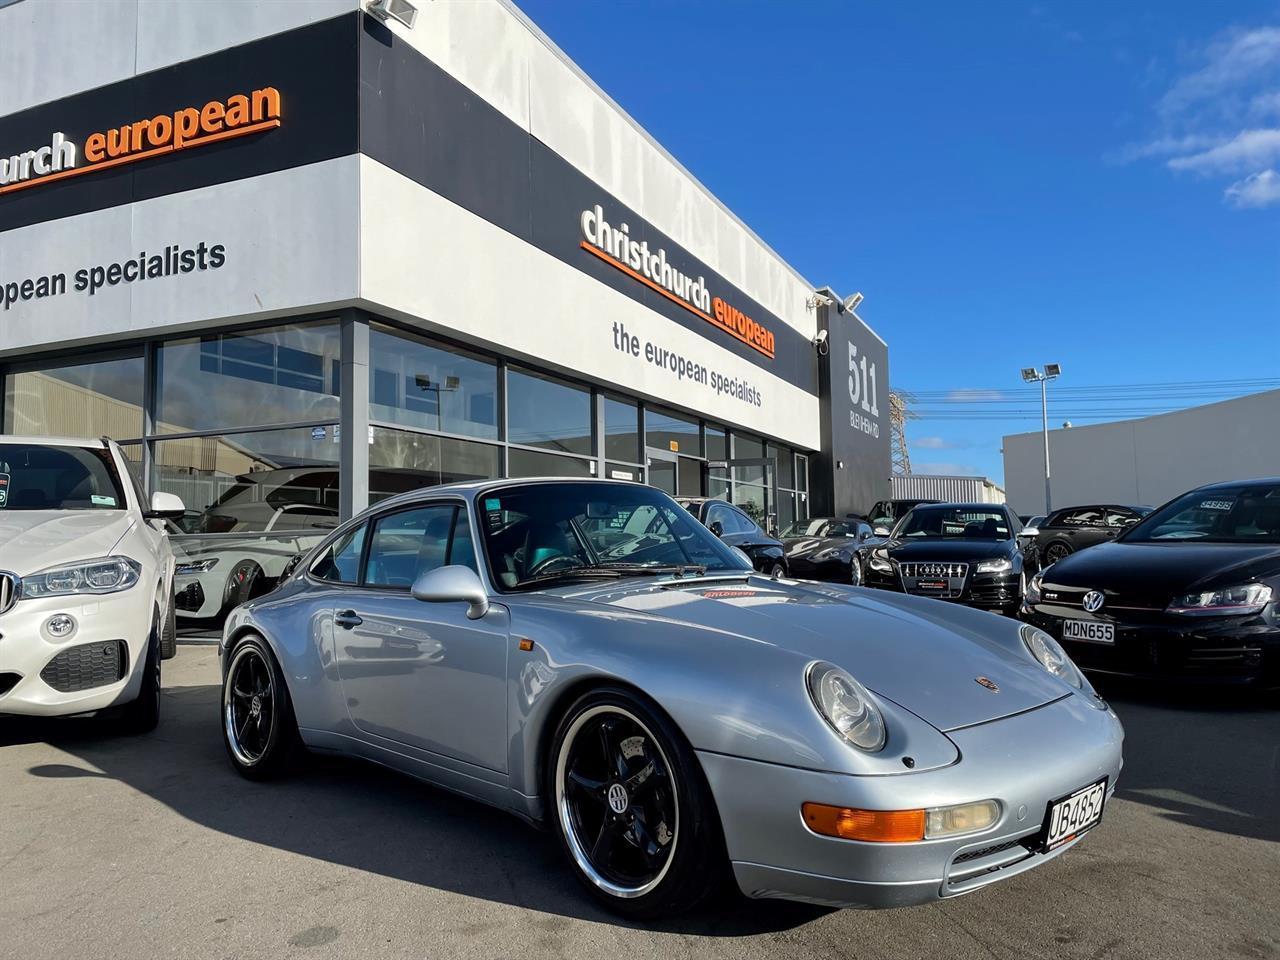 image-0, 1996 Porsche 911 993 Carrera 2 at Christchurch